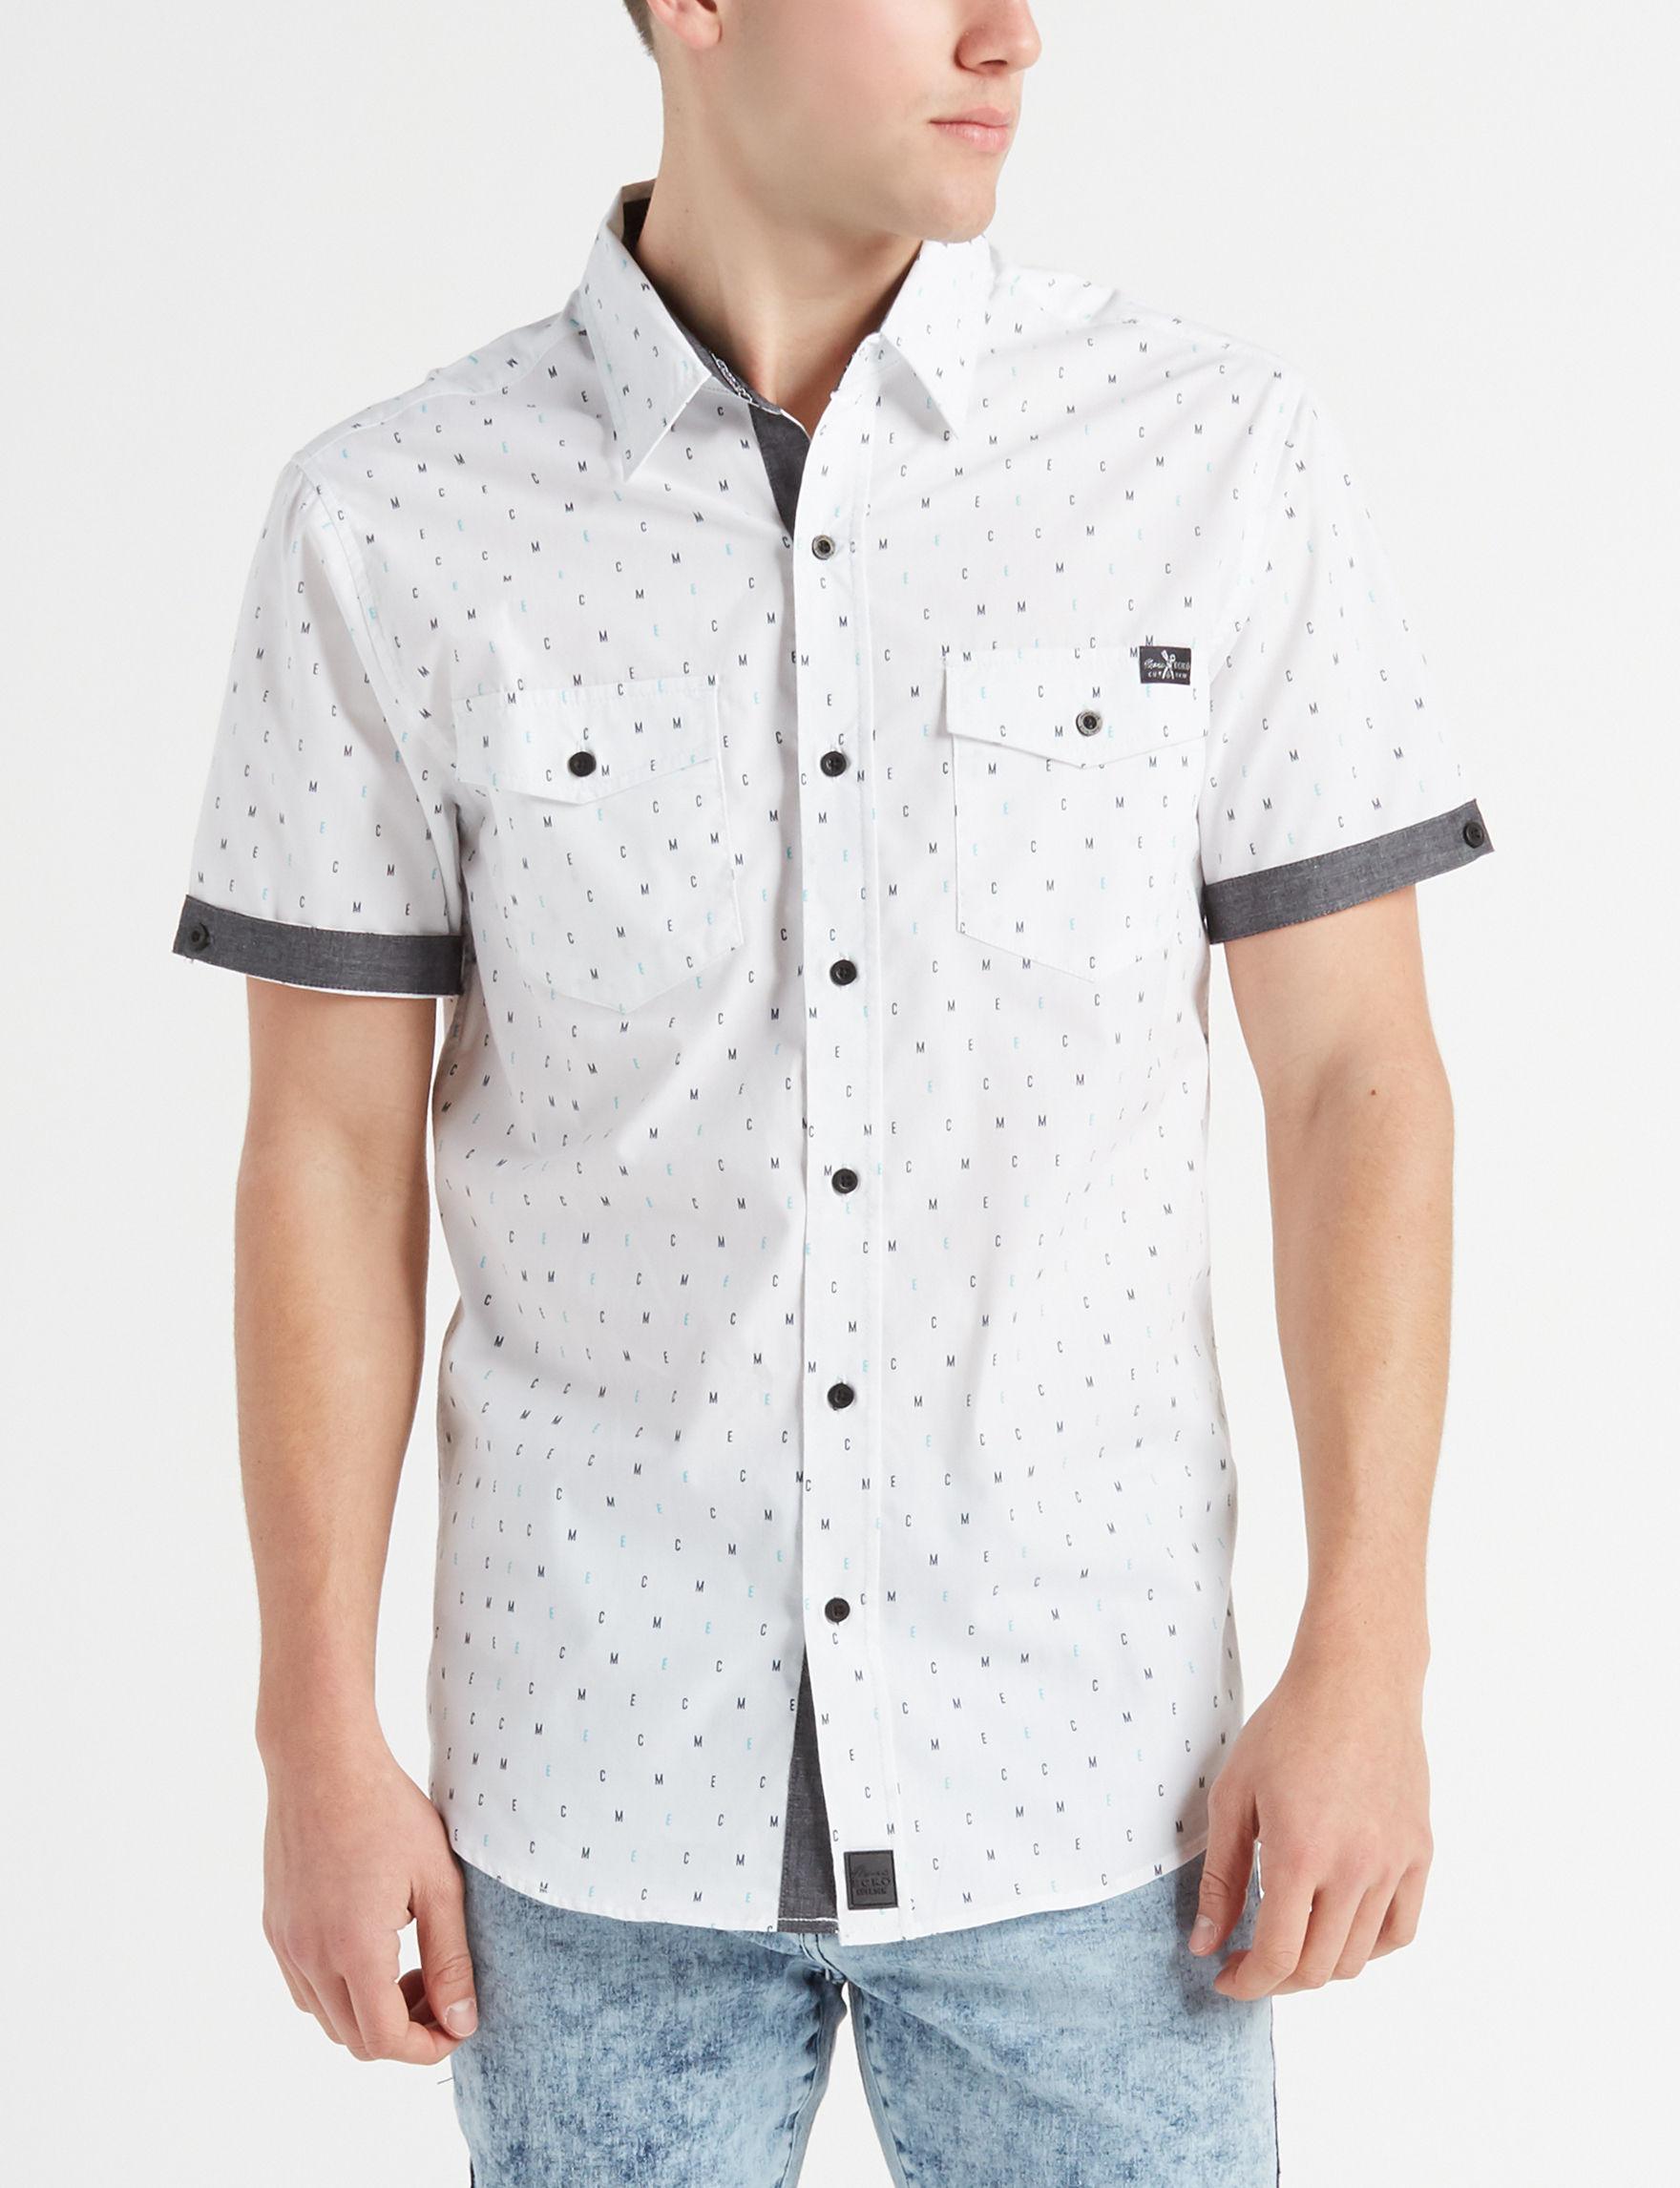 Marc Ecko White Multi Casual Button Down Shirts